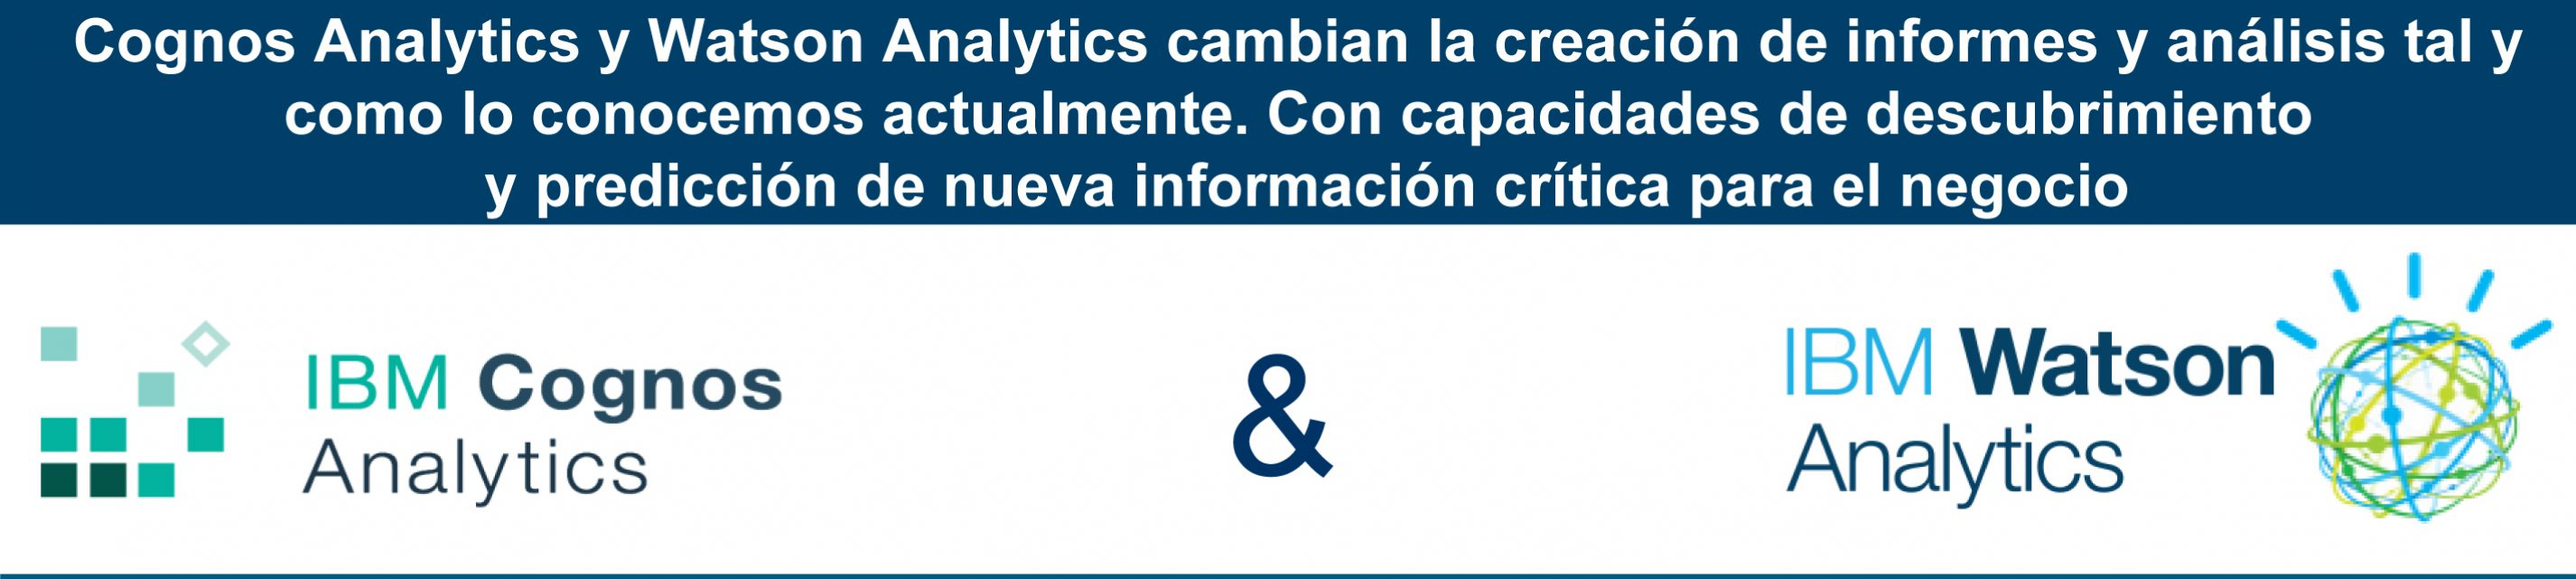 Cognos Analytics, Watson Analytics